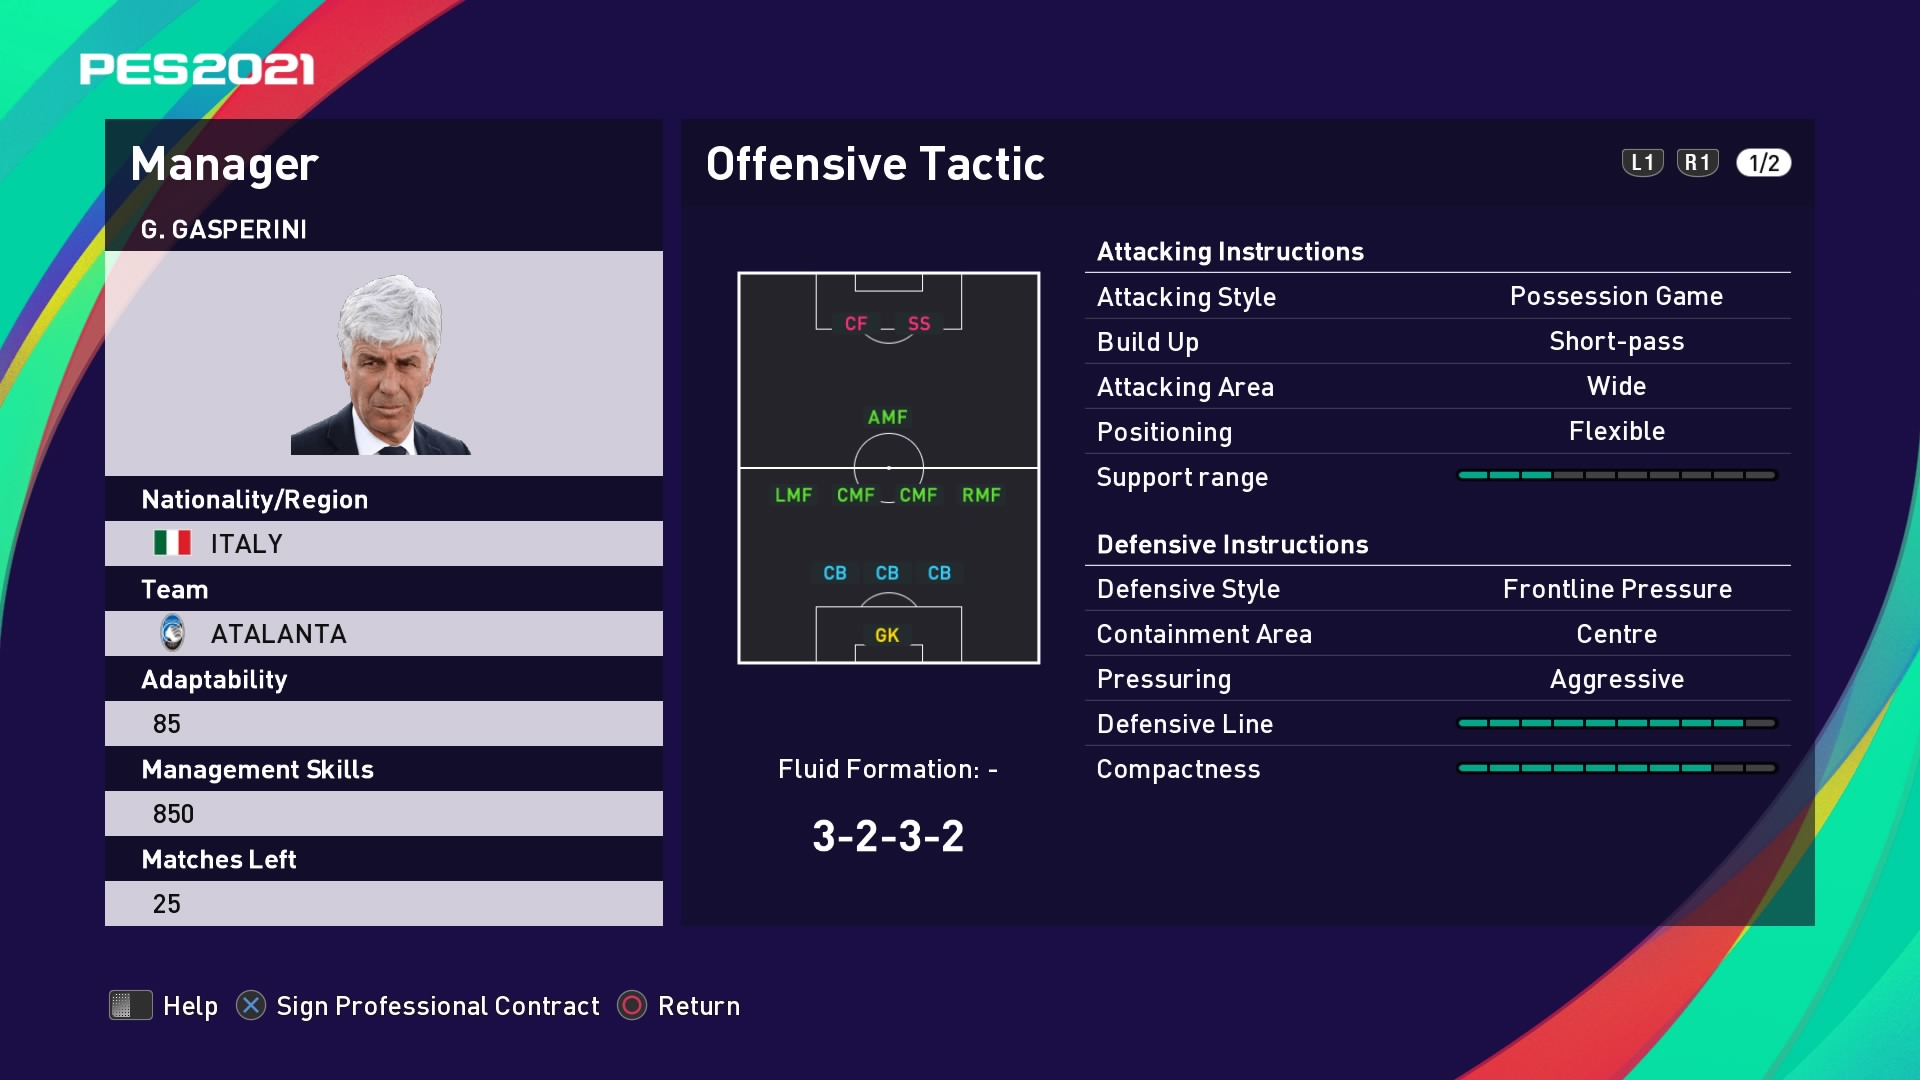 G. Gasperini (Gian Piero Gasperini) Offensive Tactic in PES 2021 myClub